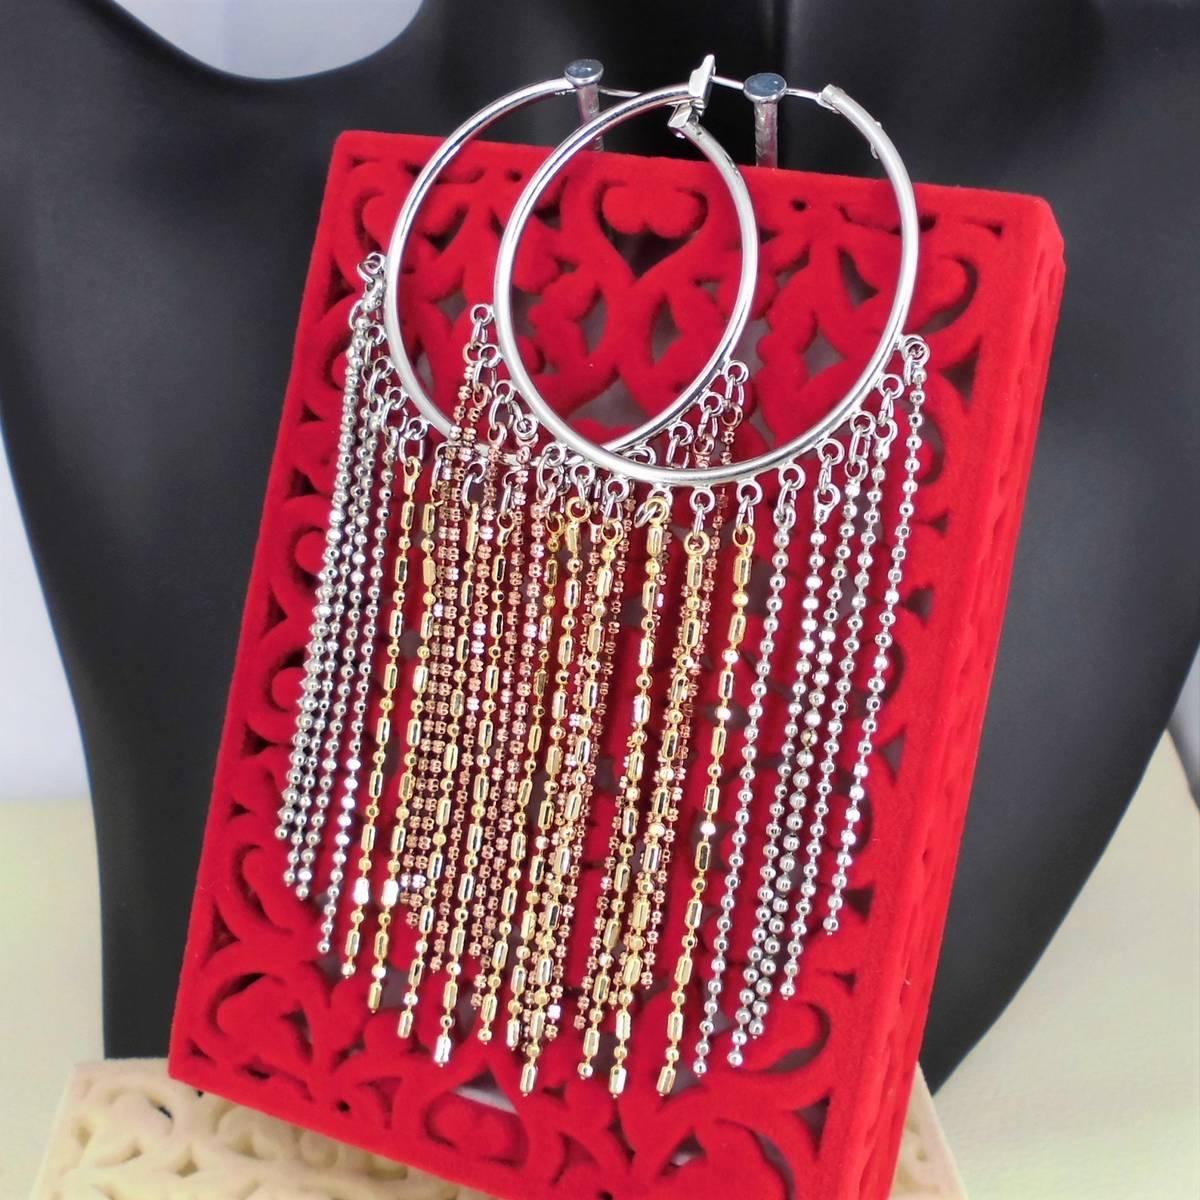 Fashion jewelry earrings dangler chains baali